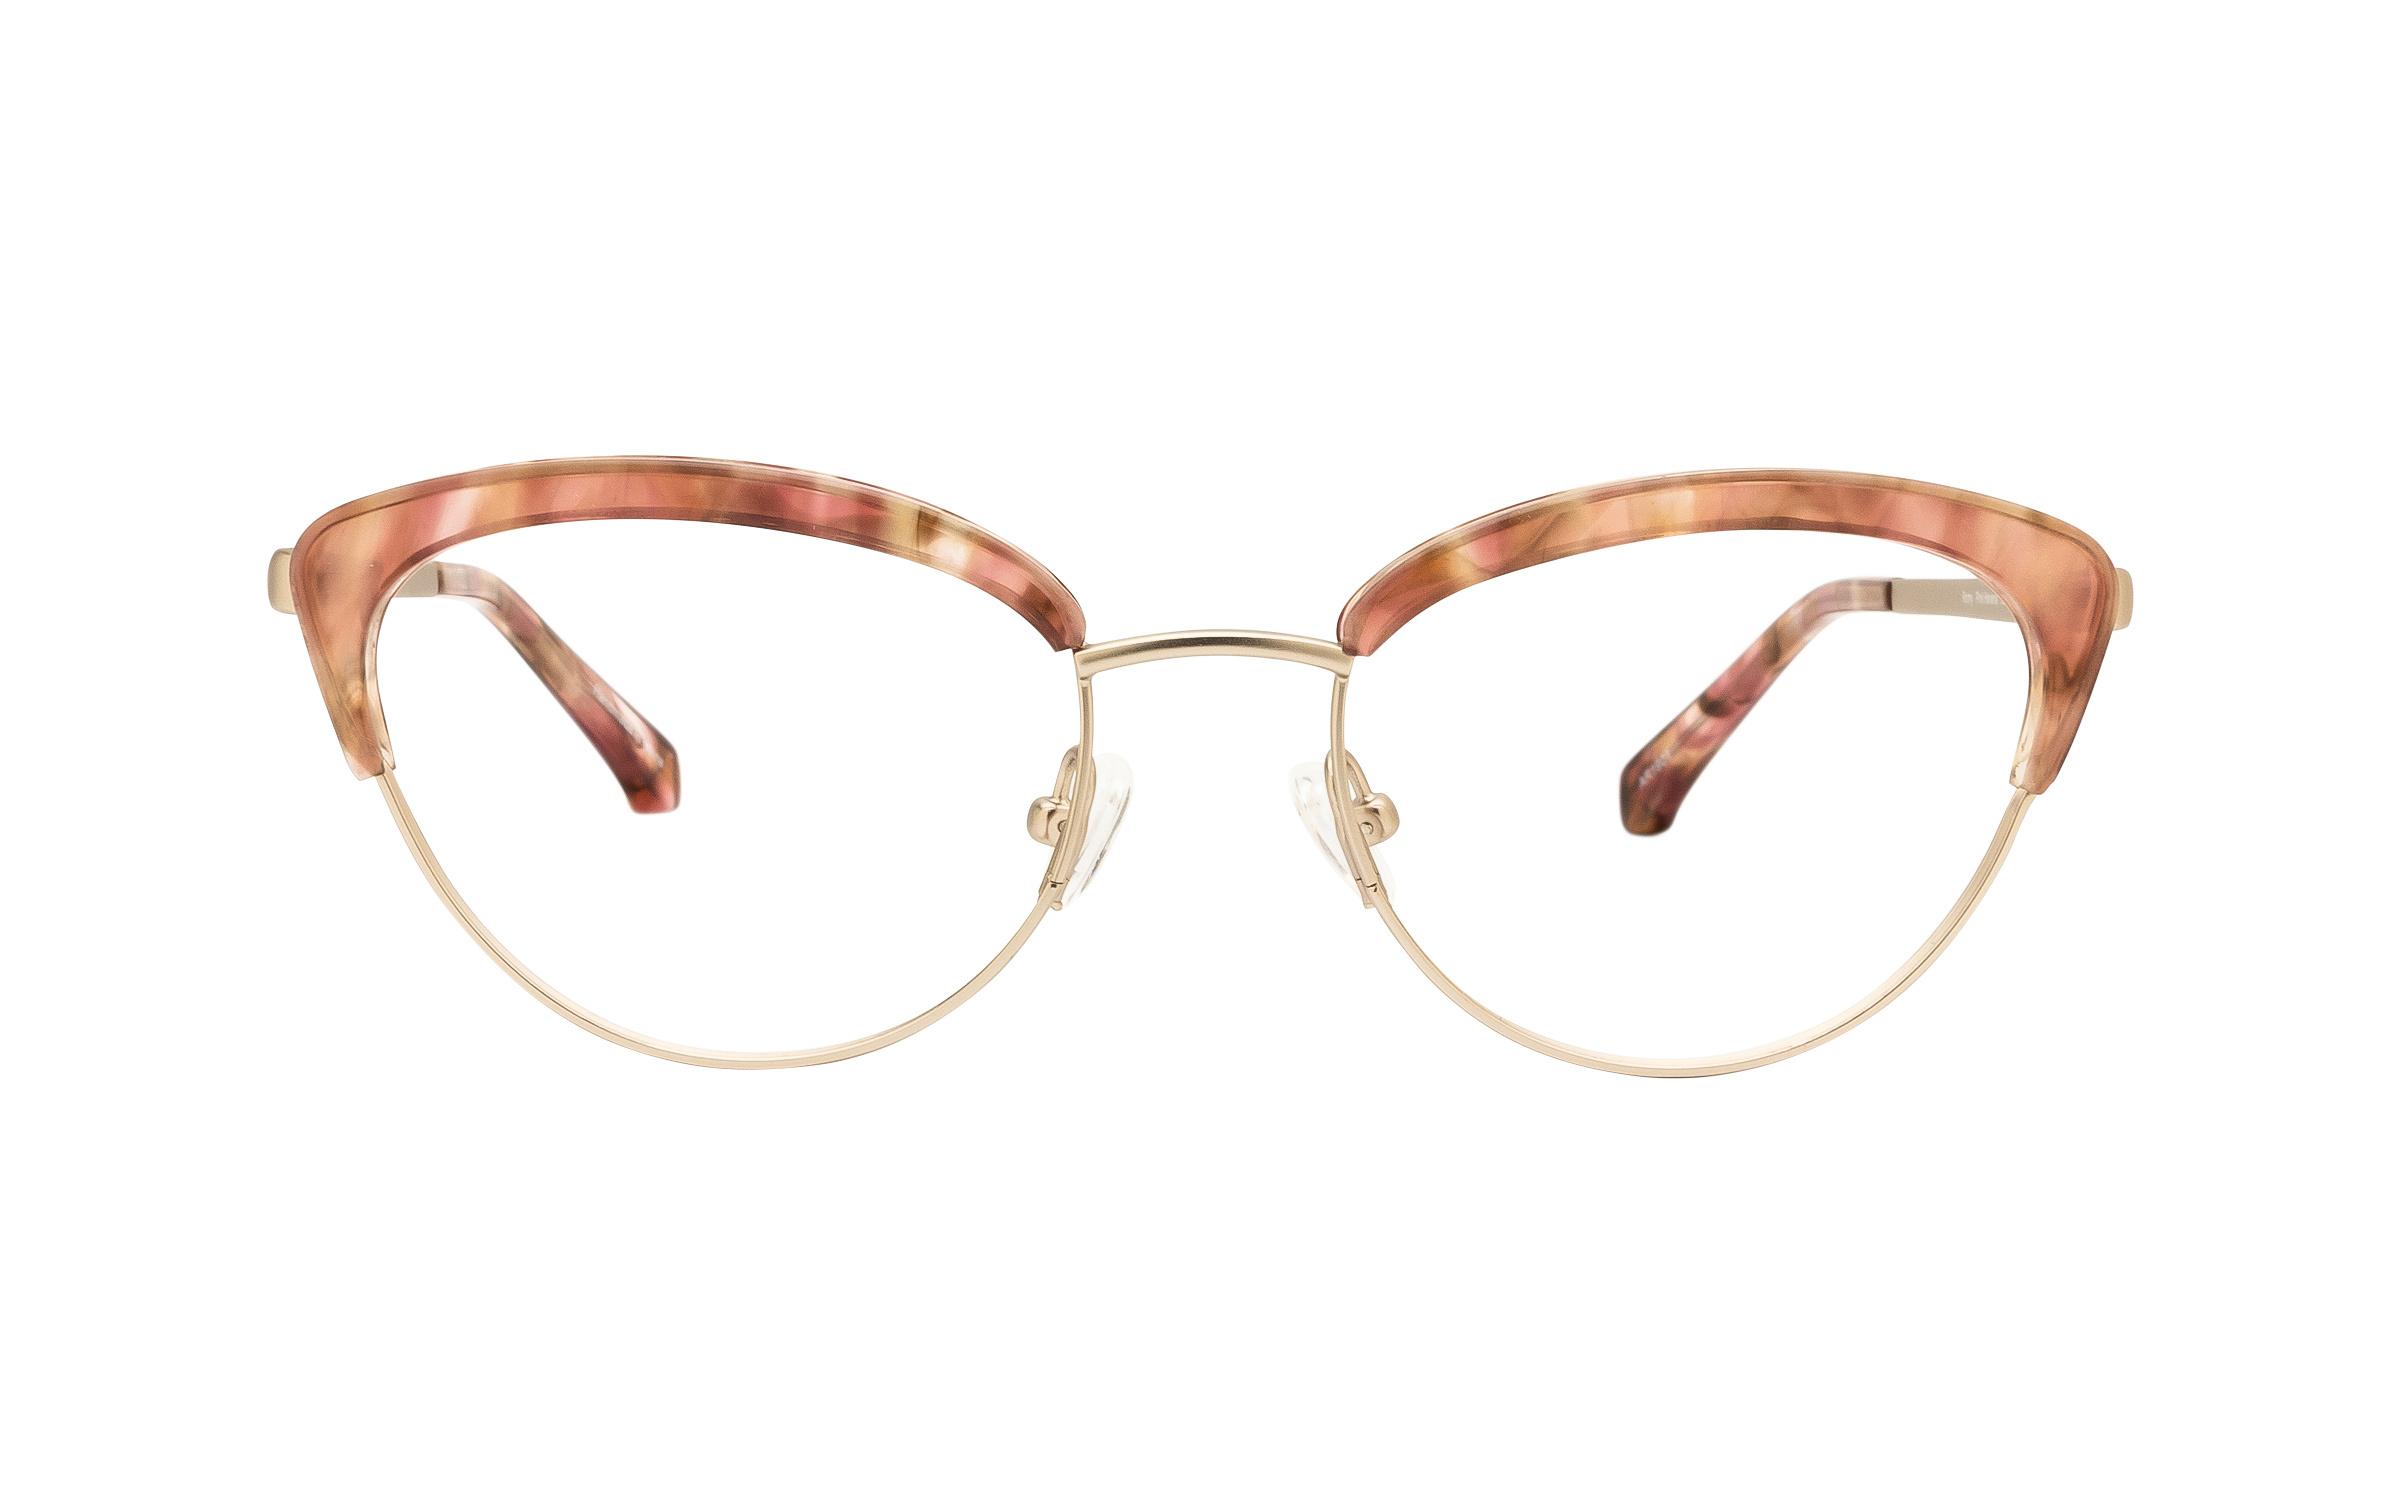 Kam Dhillon Romy KD065 C02 (52) Eyeglasses and Frame in Havana Pink | Plastic/Metal - Online